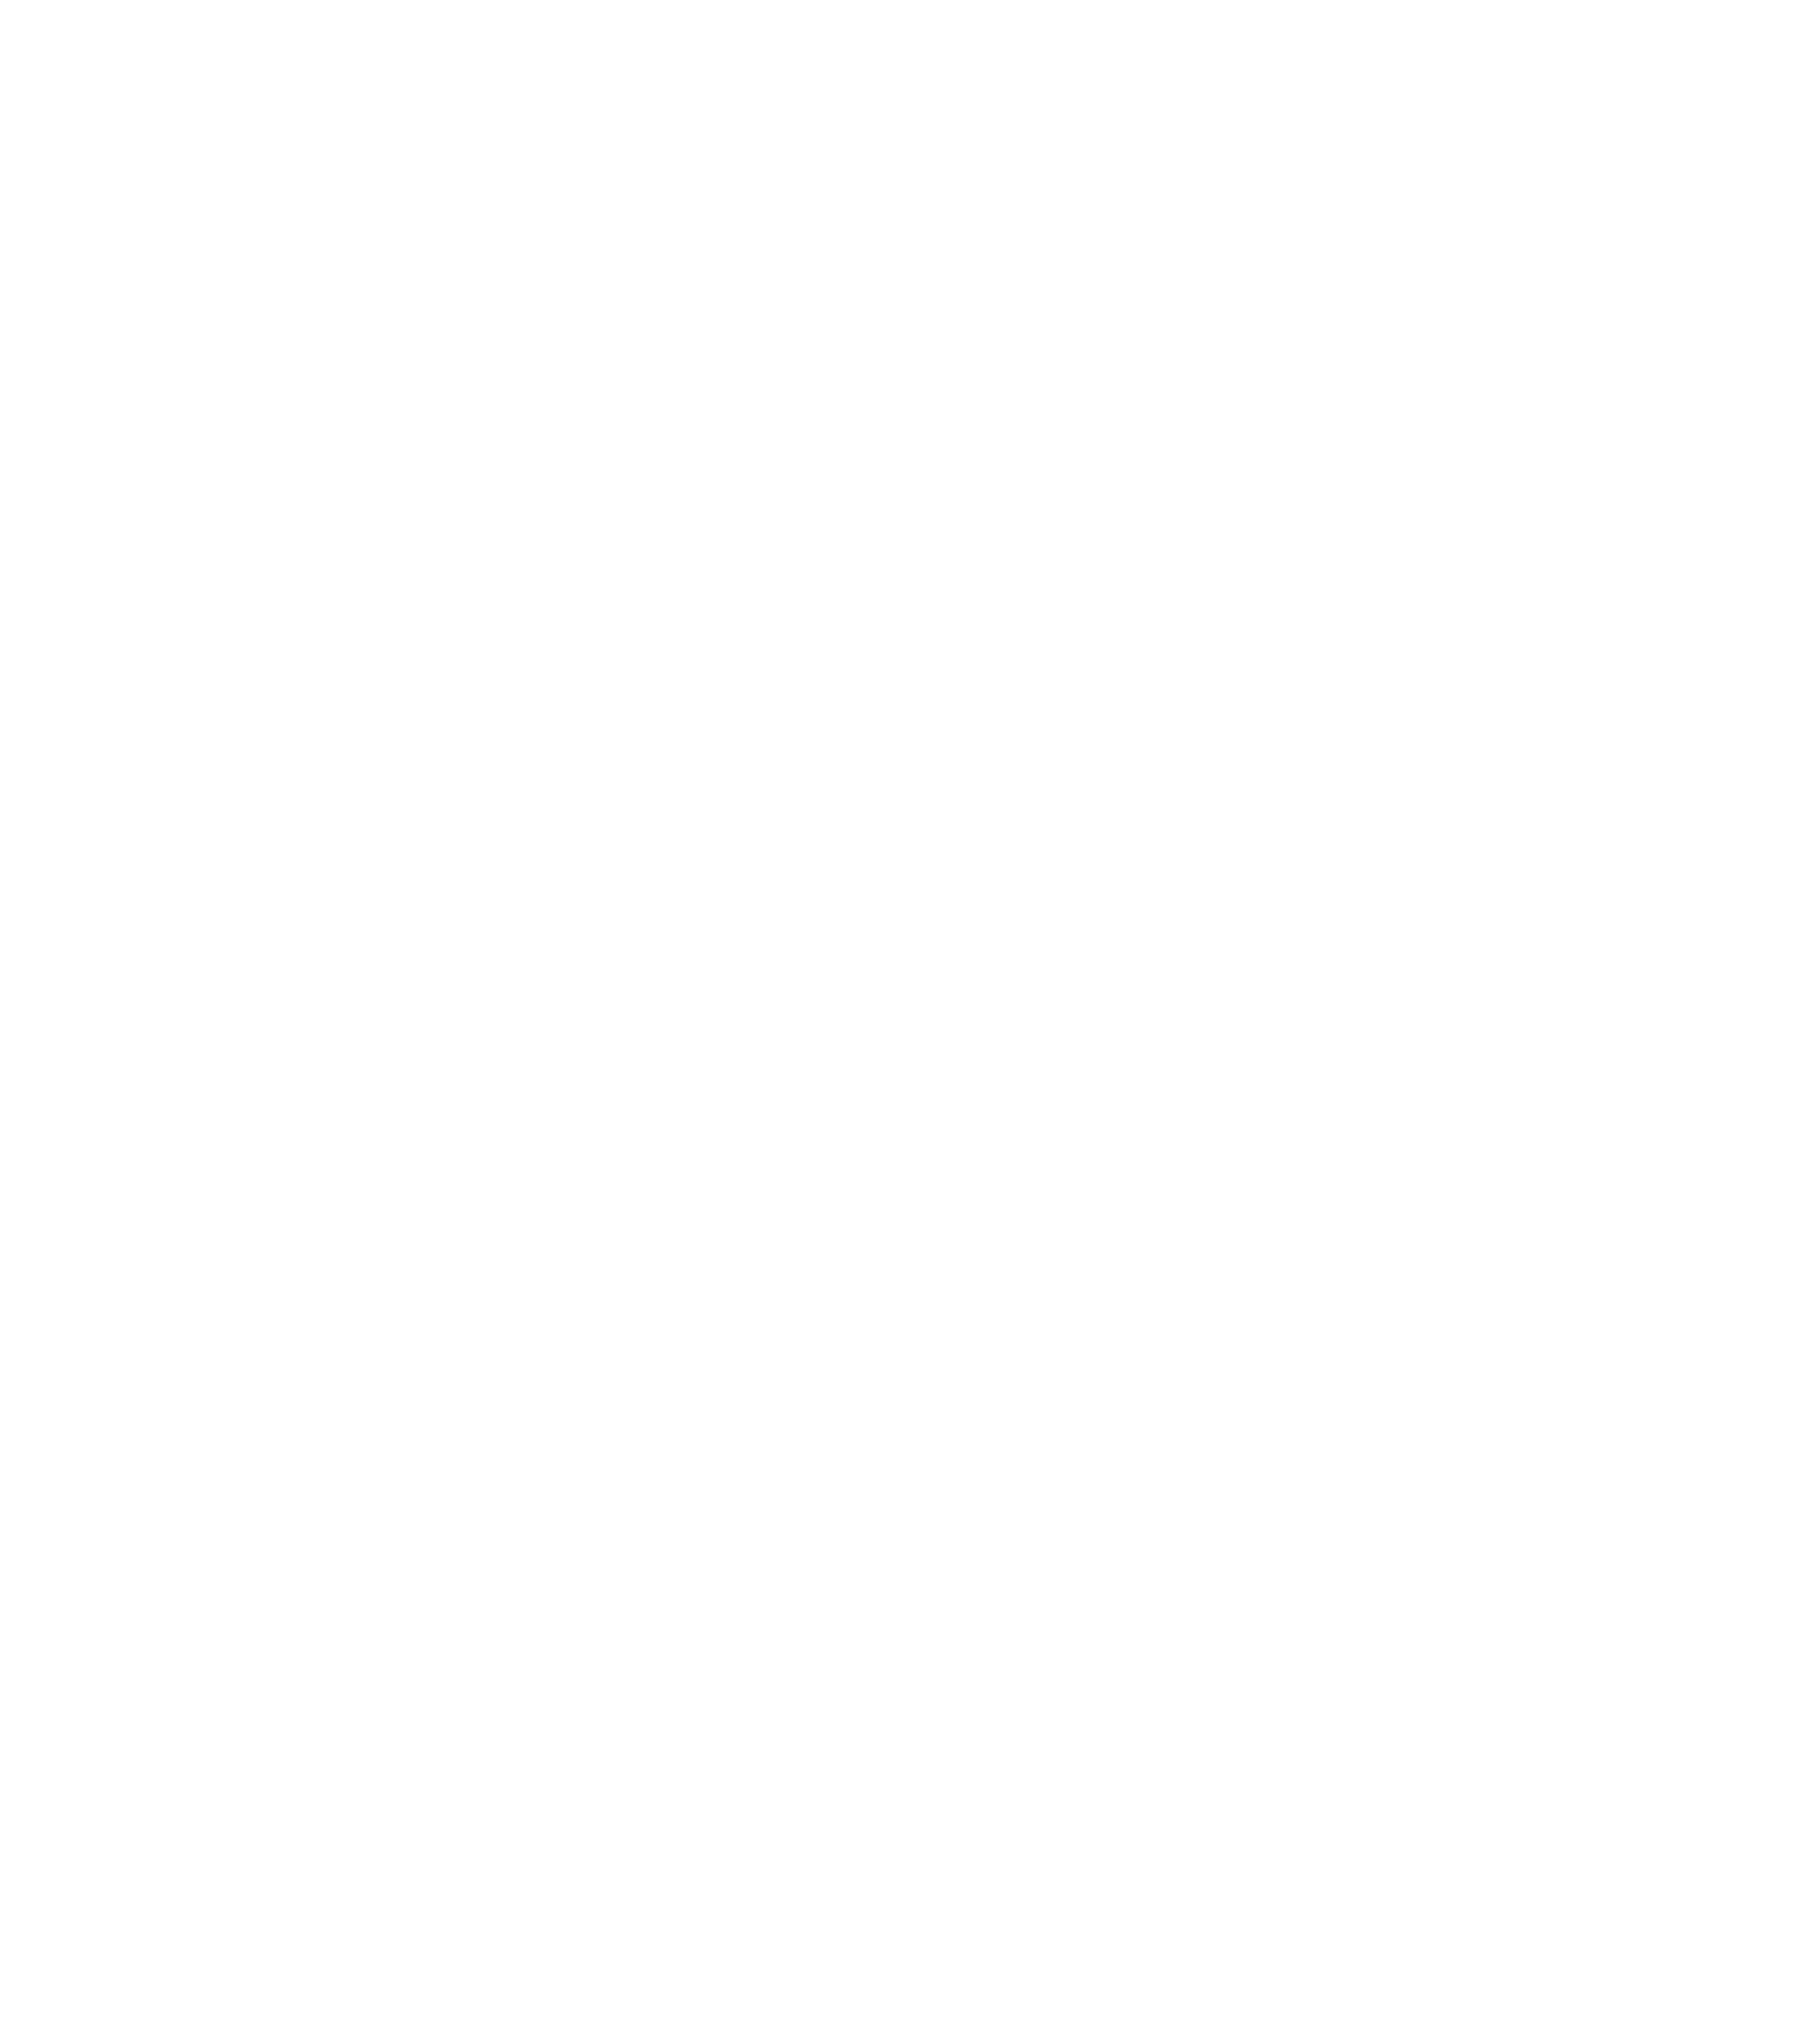 Snowflakes png clip art. Crystal clipart black snowflake